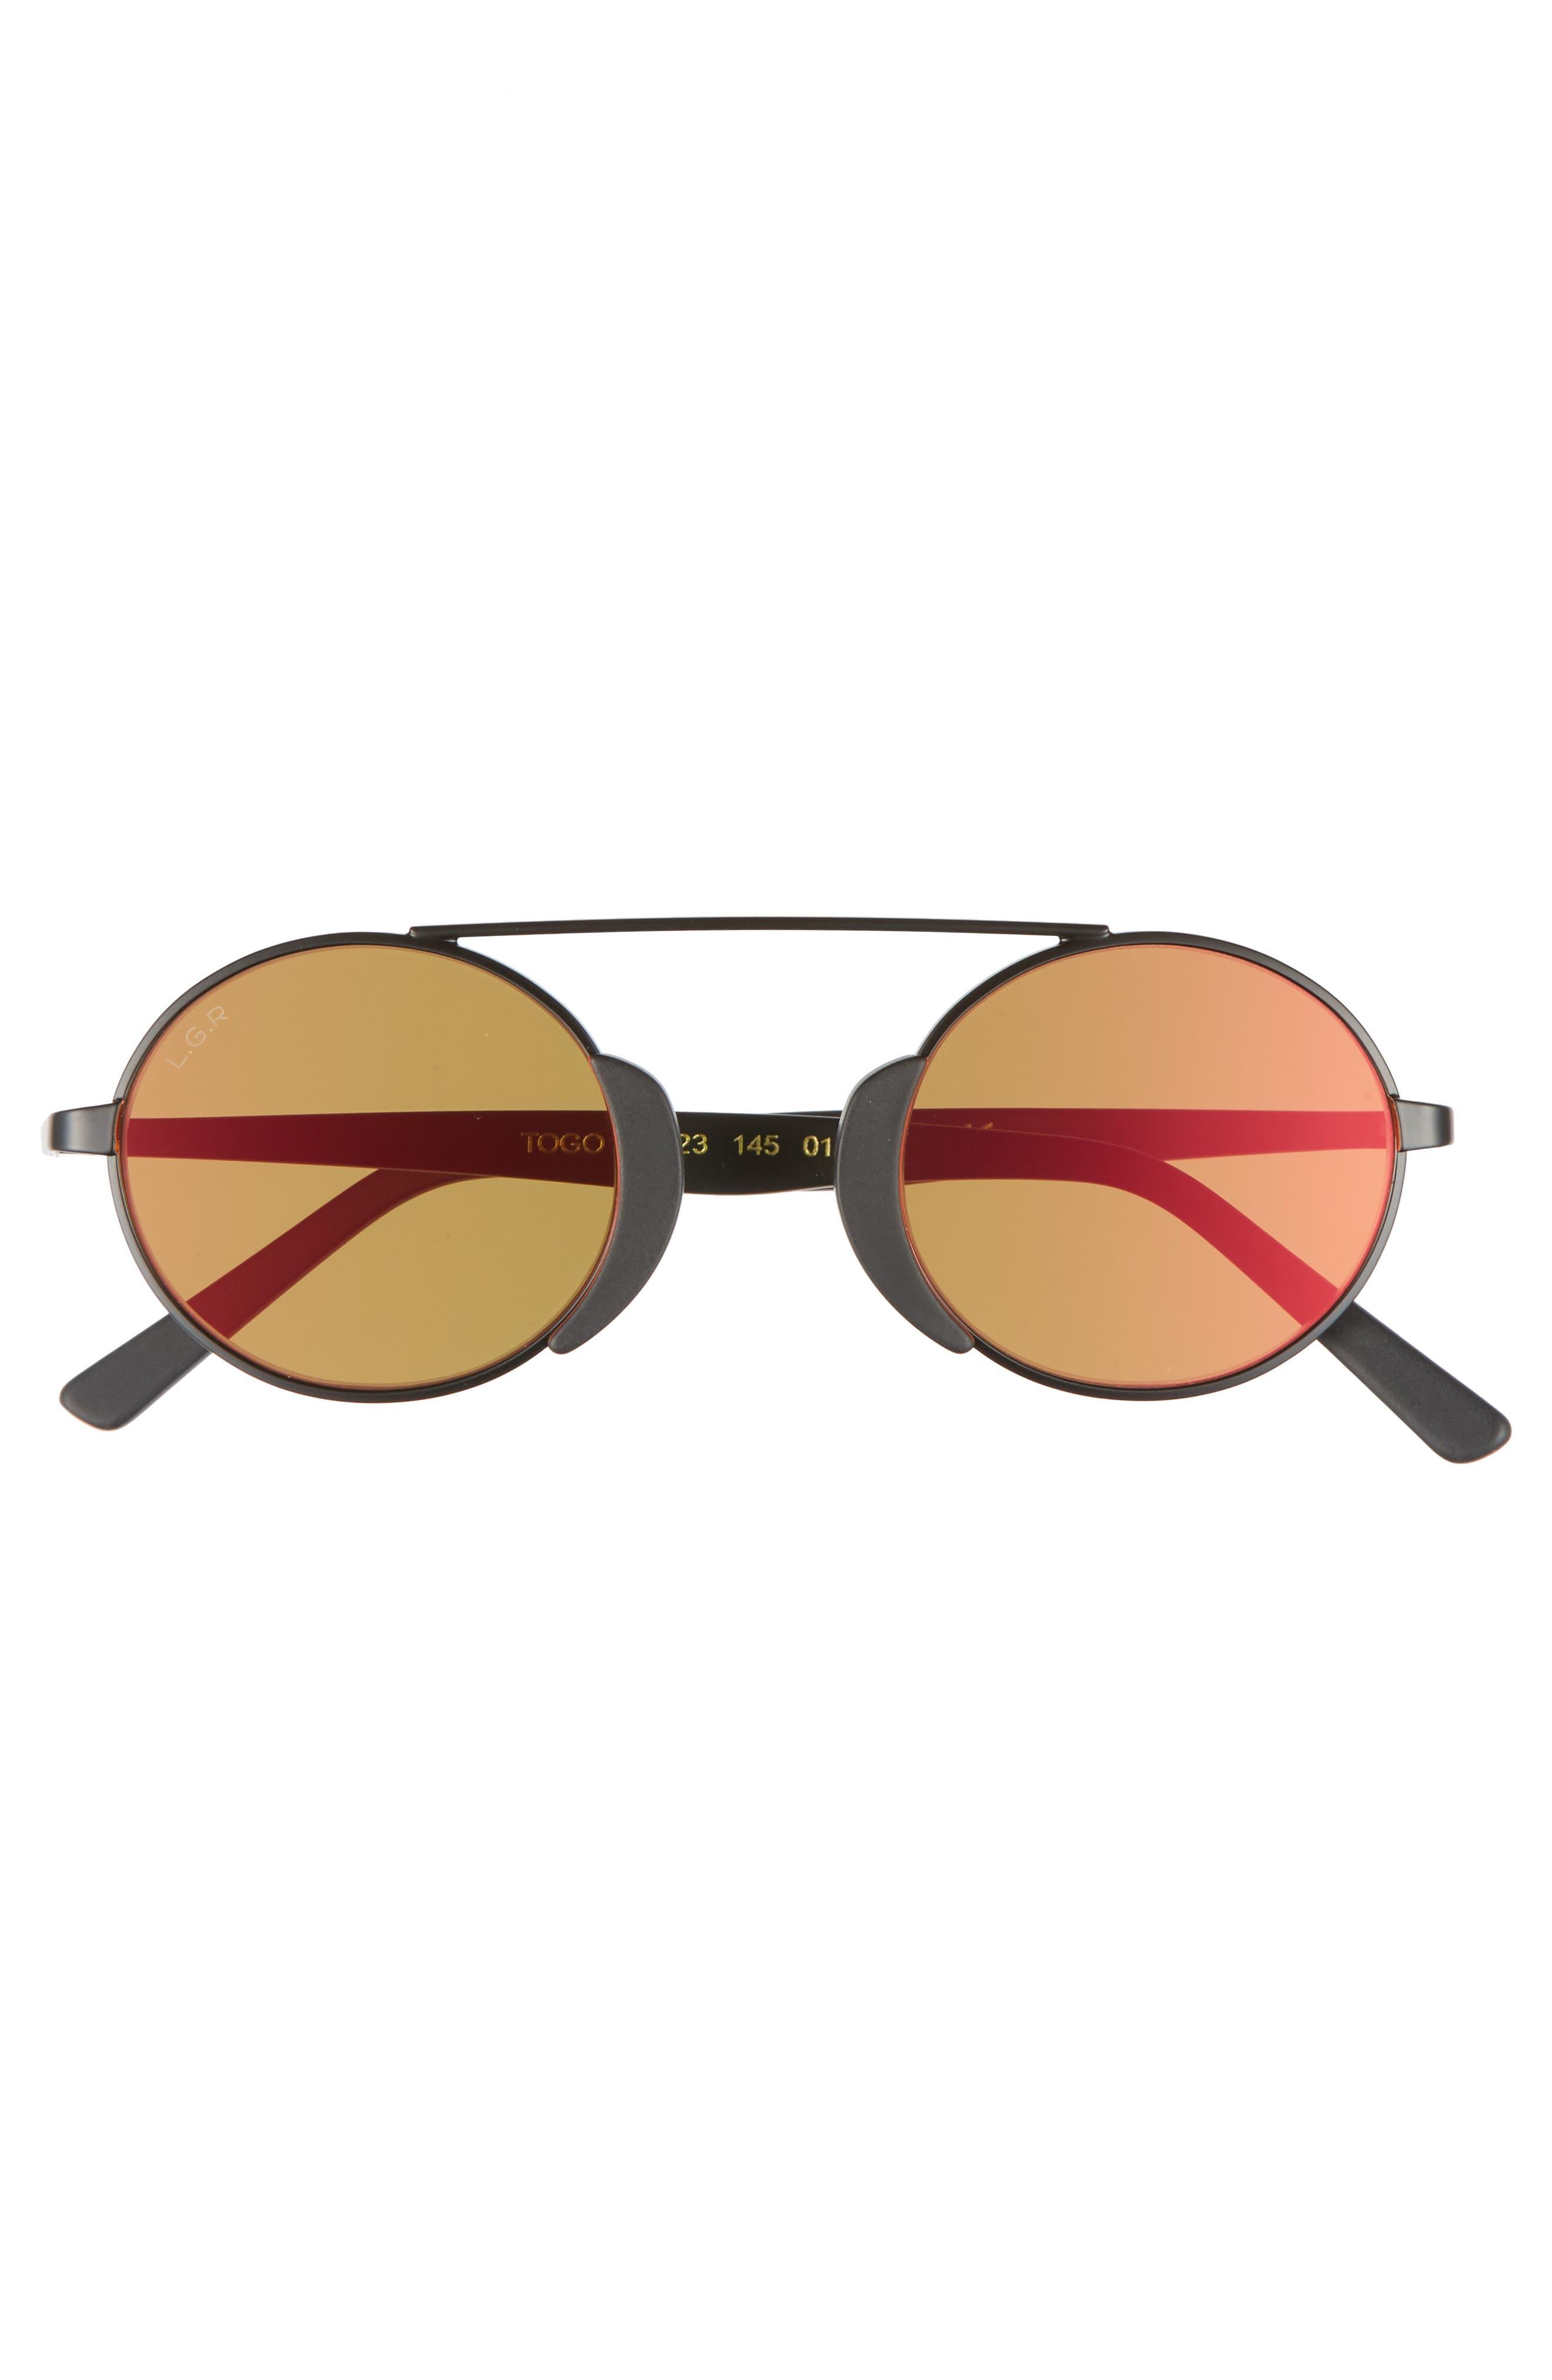 Alternate Image 2  - L.G.R Togo 48mm Sunglasses